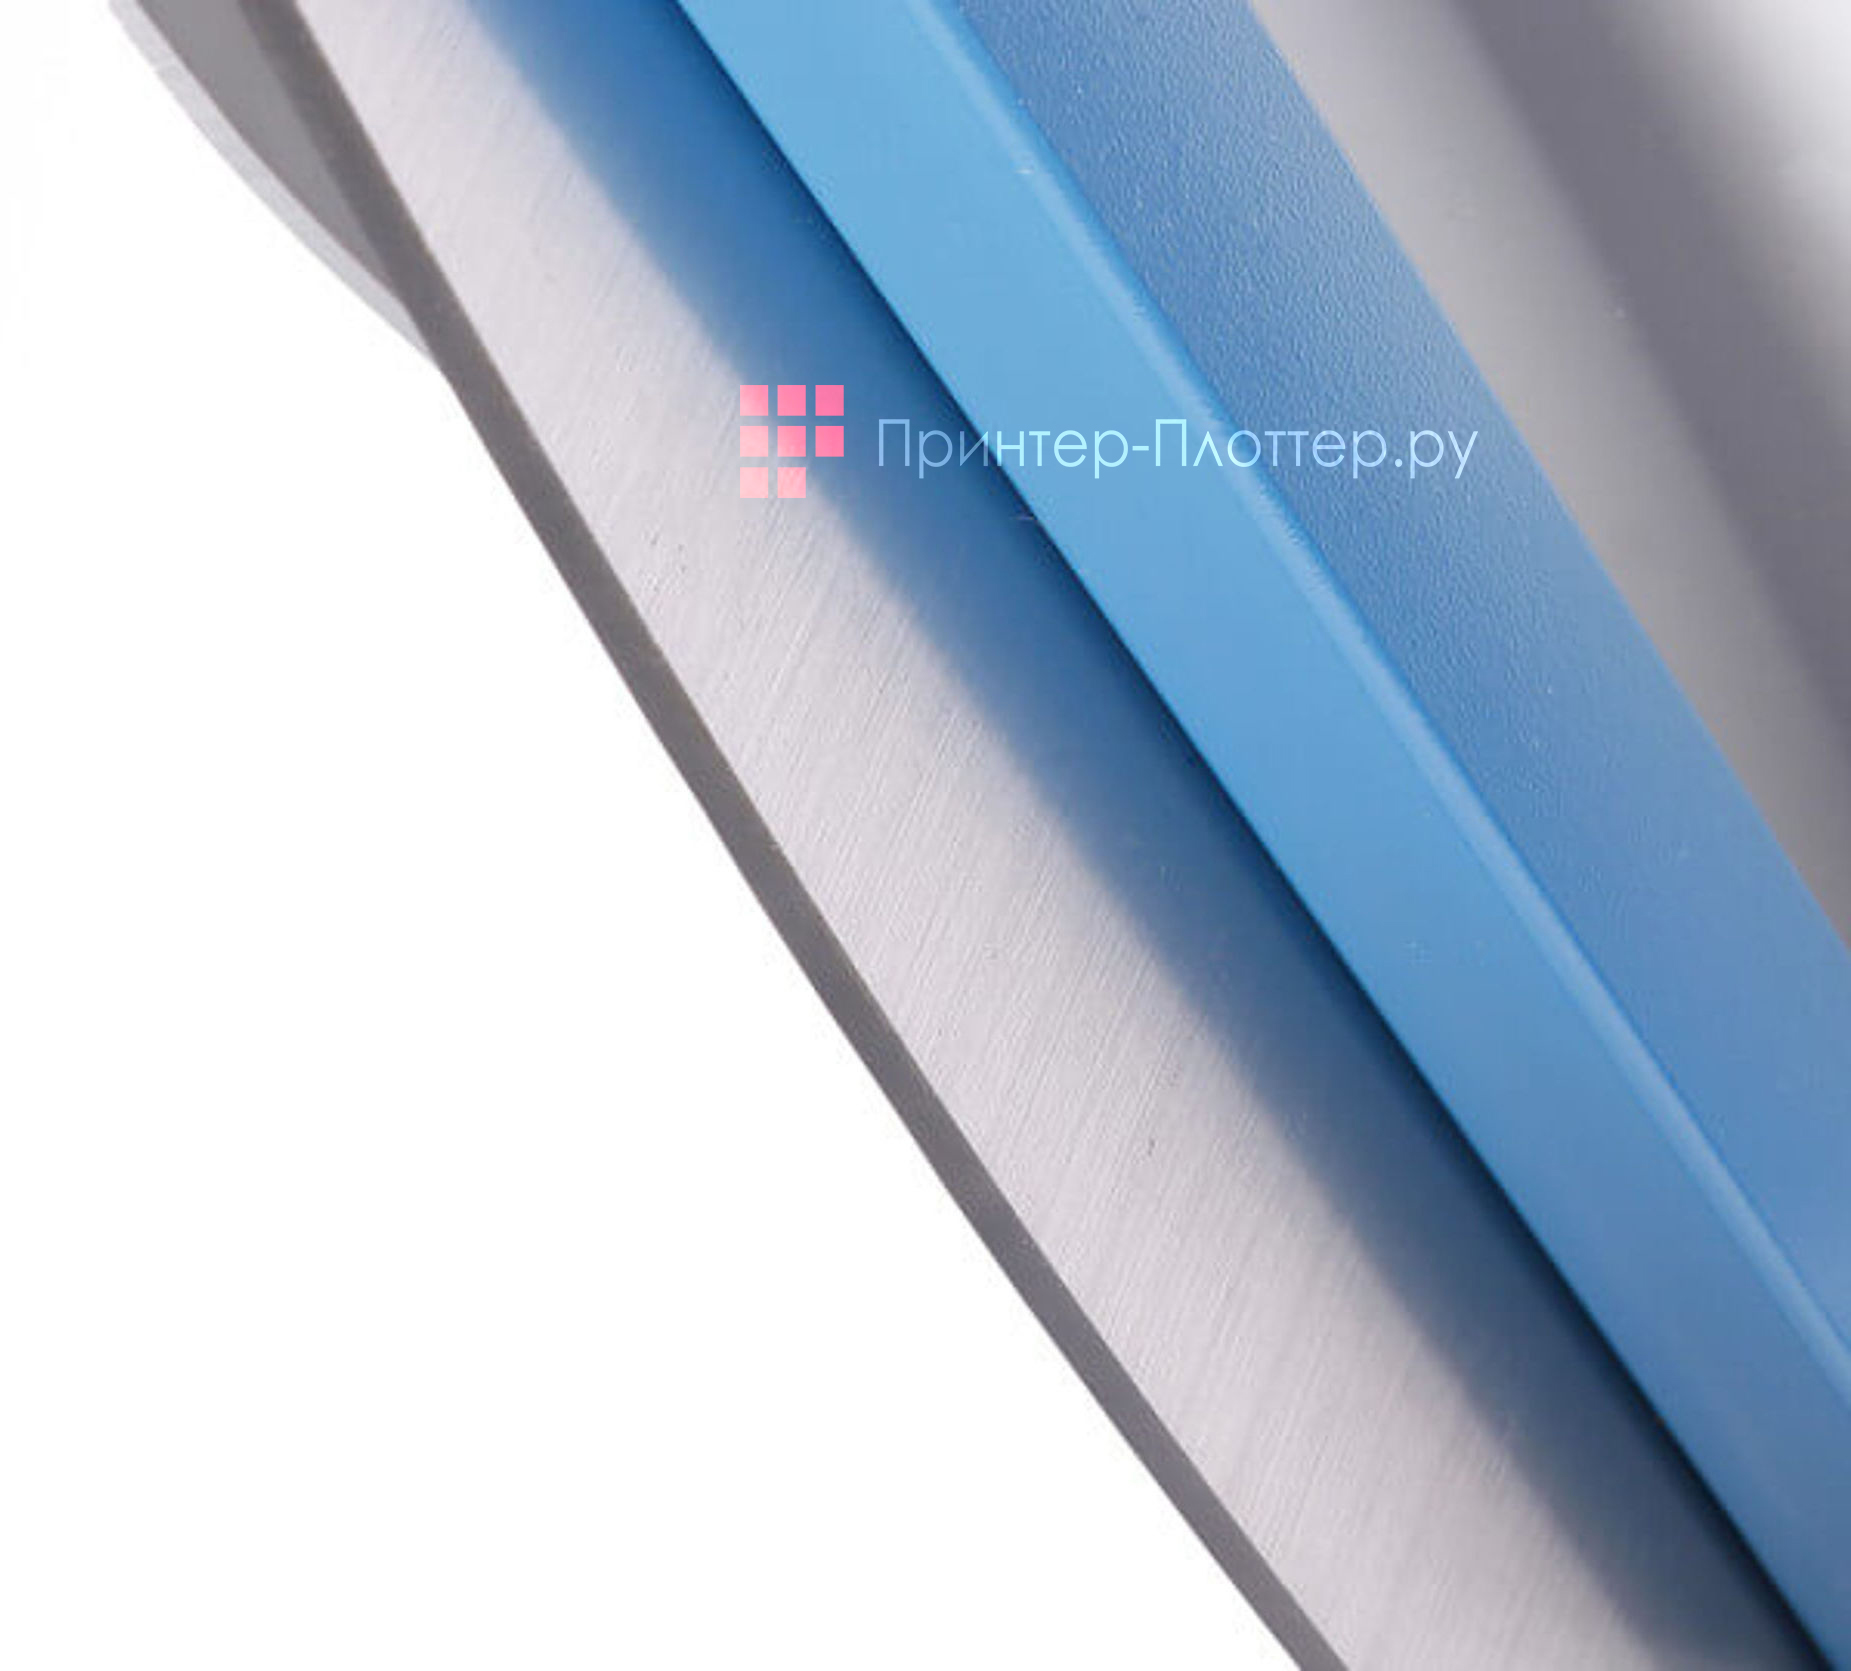 Dahle 517. Нож для материалов